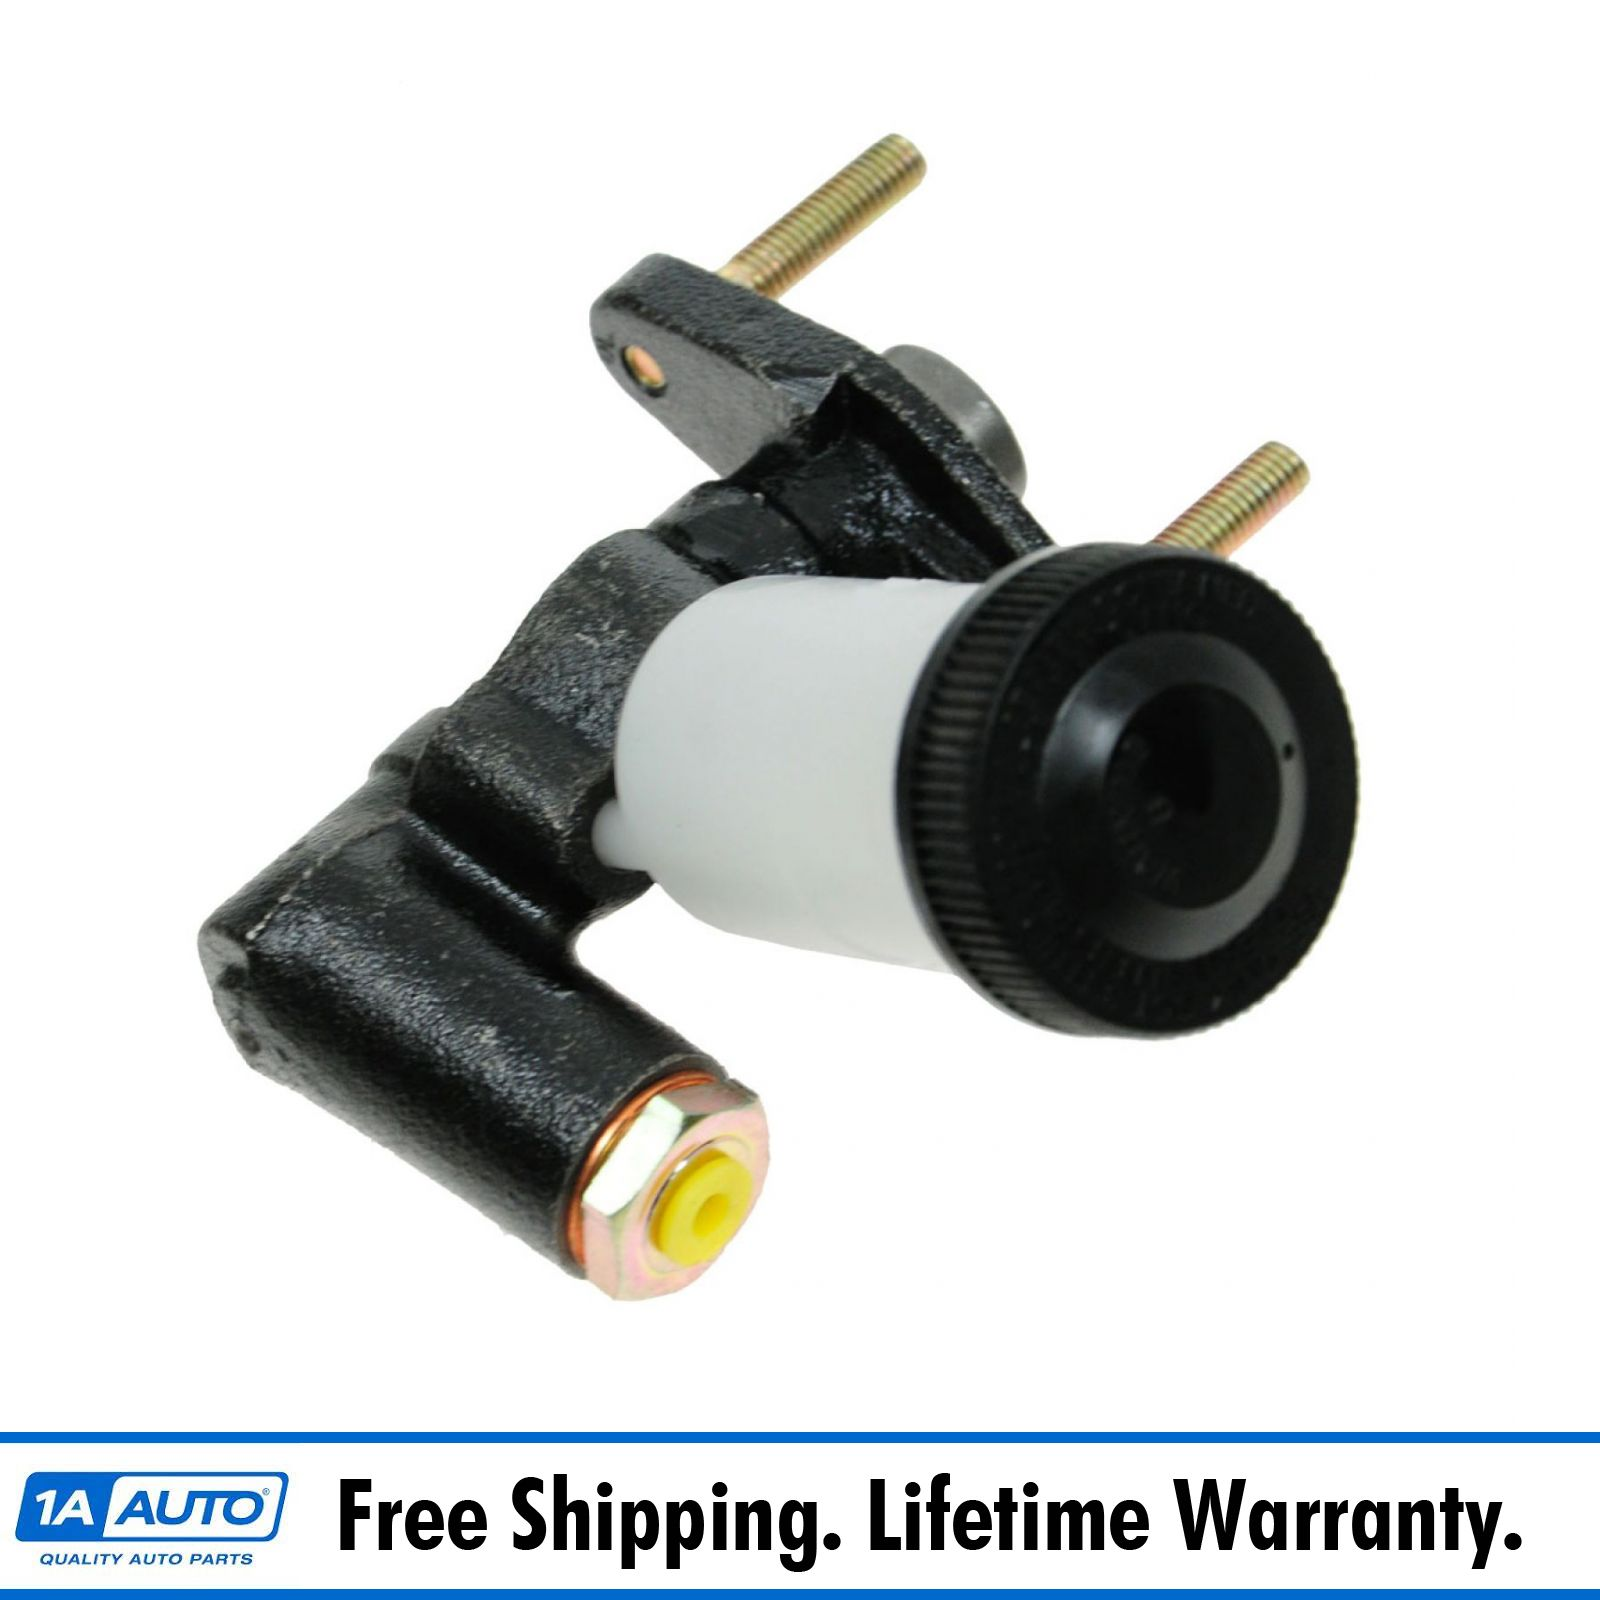 Clutch Master Cylinder for Mazda Pickup B 2600 2200 2000